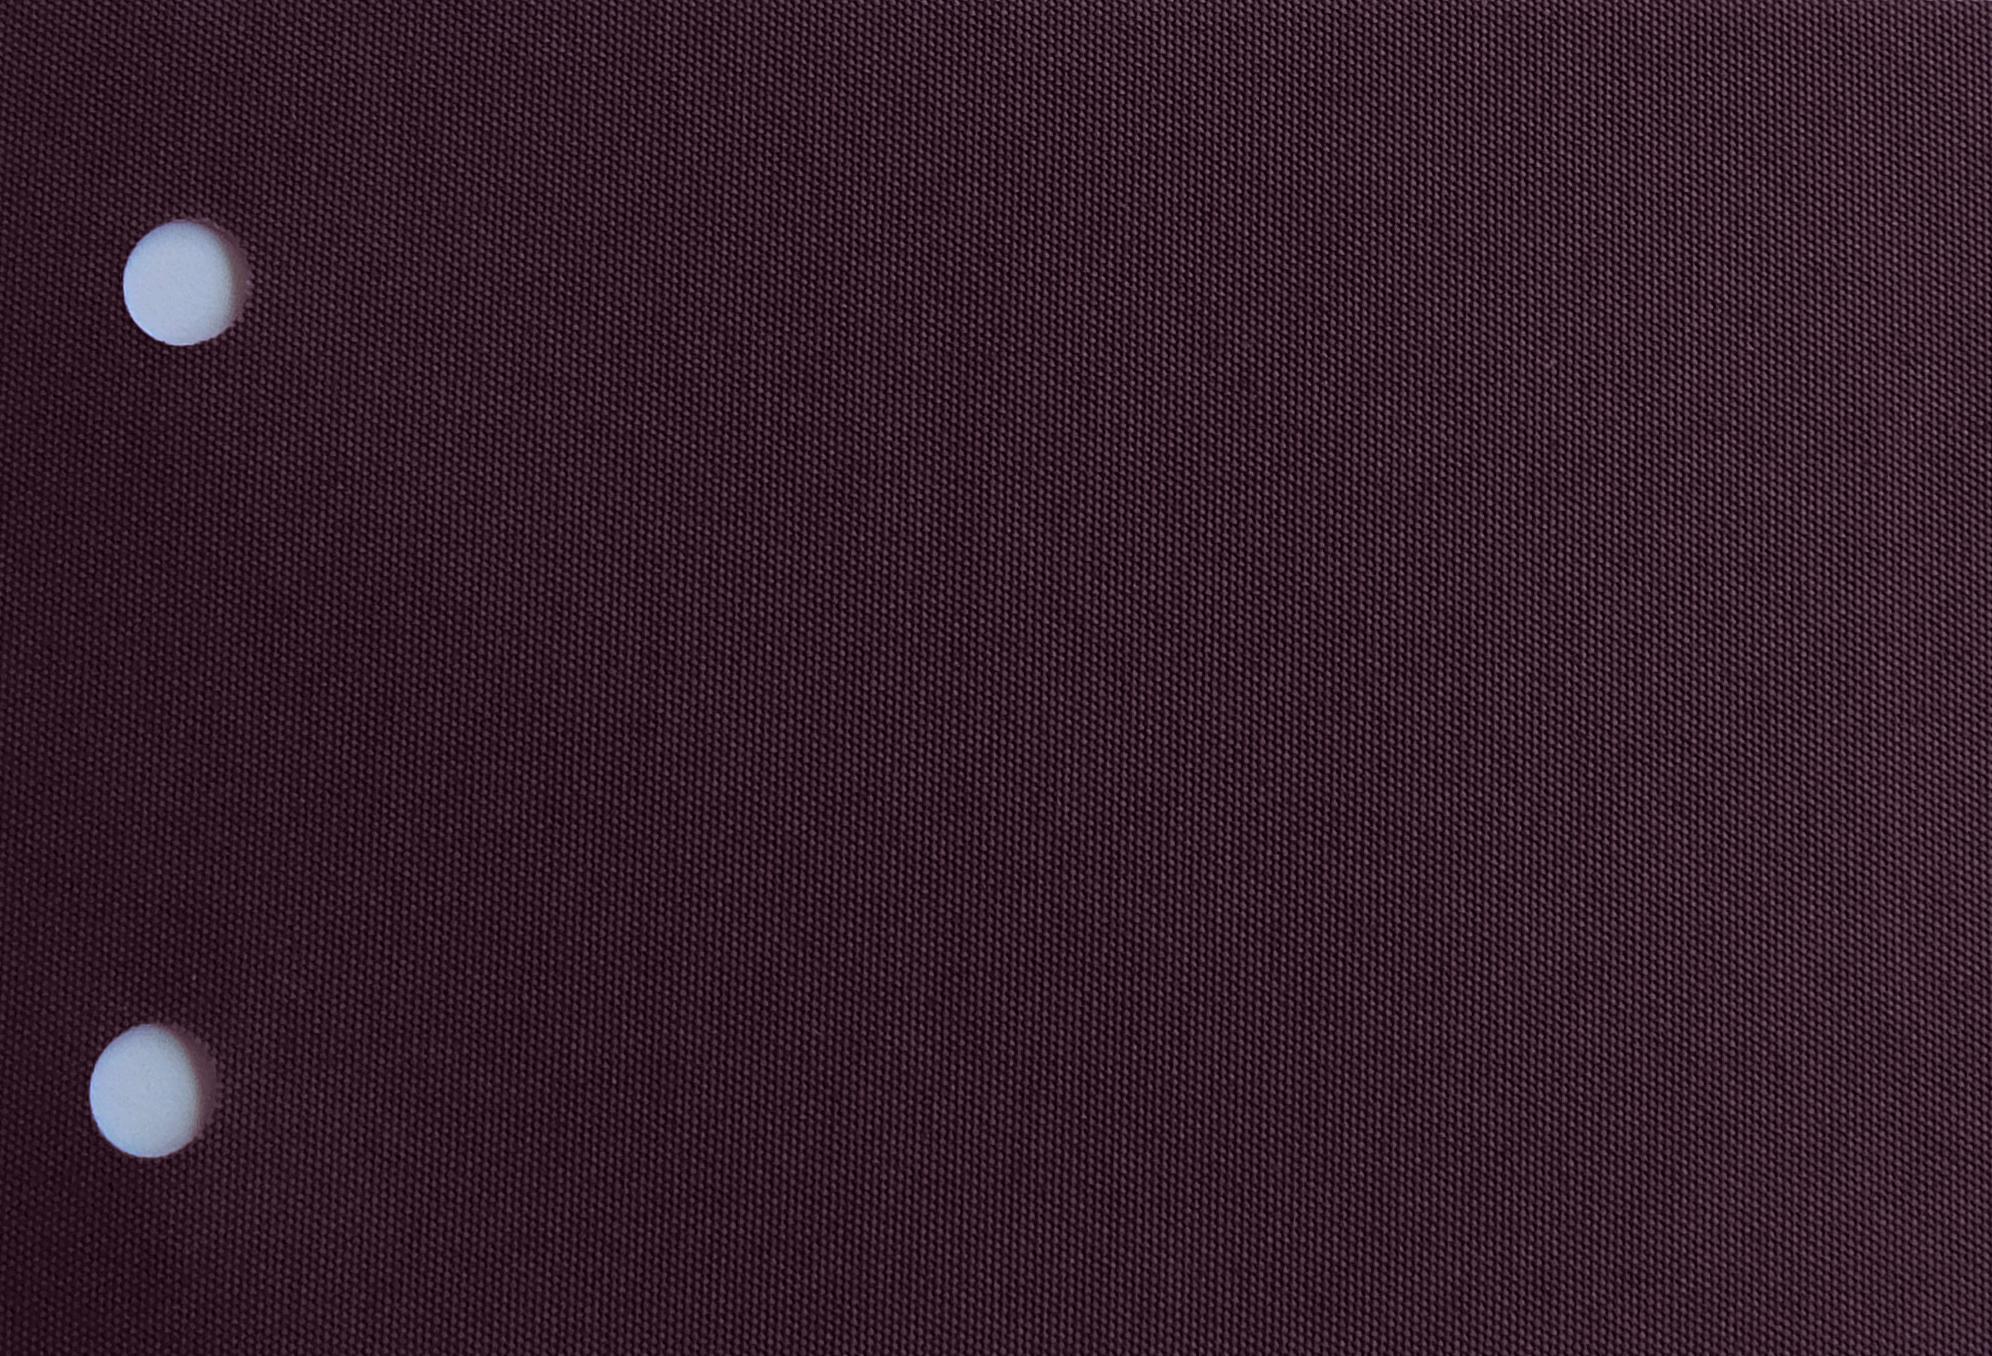 Carnival Purple Blind fabric